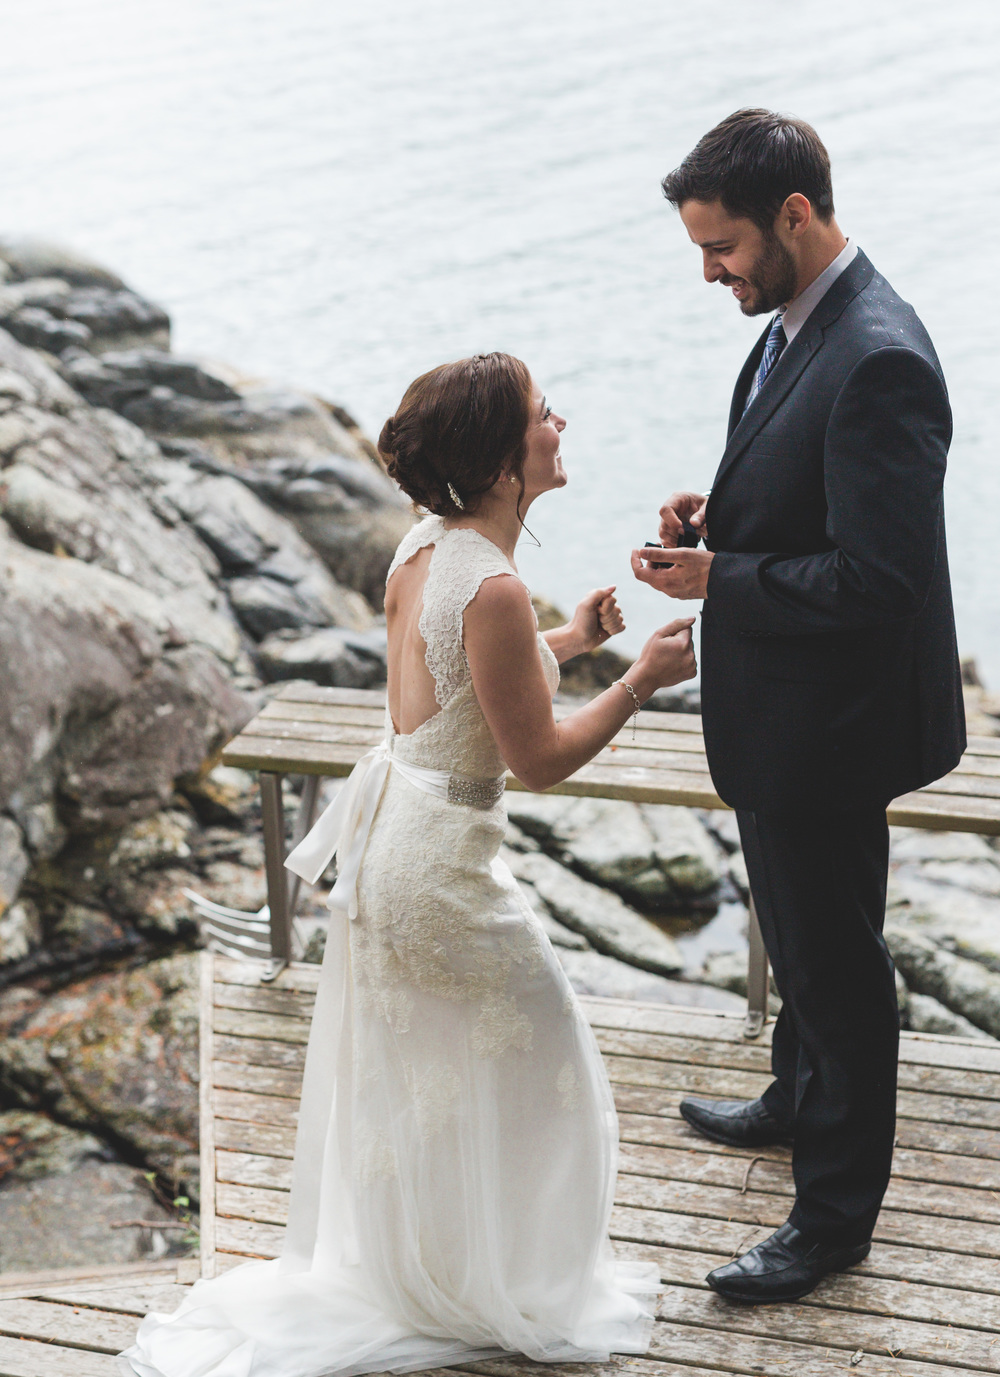 IMG_0659 JENNIFER PICARD PHOTOGRAPHY VANCOUVER WEDDING PHOTOGRAPHER.jpg